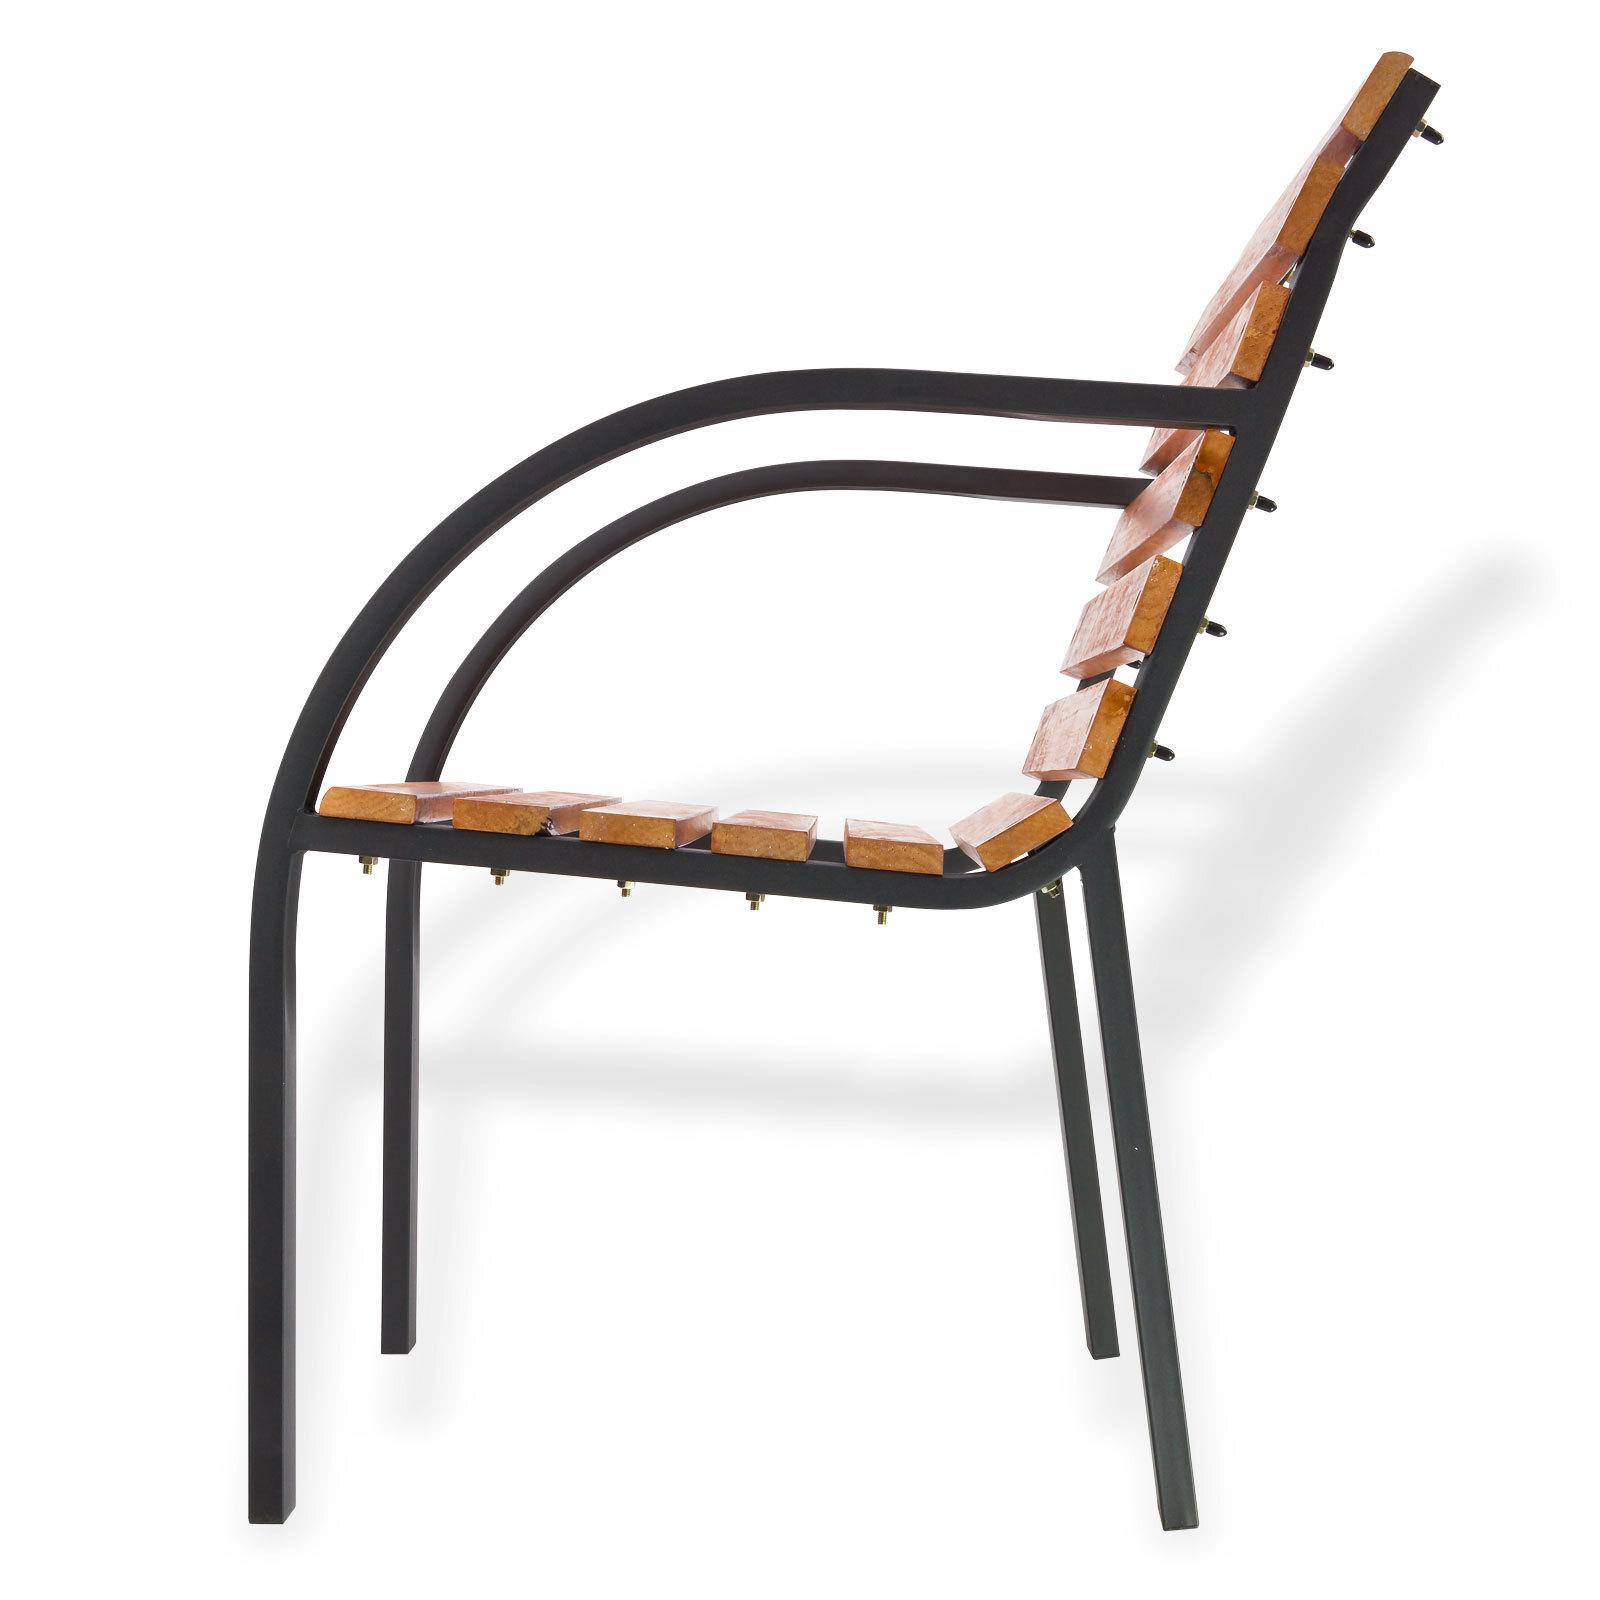 gartenm bel gartenstuhl gartensessel holzstuhl stuhl modern 55cm holz metall ebay. Black Bedroom Furniture Sets. Home Design Ideas